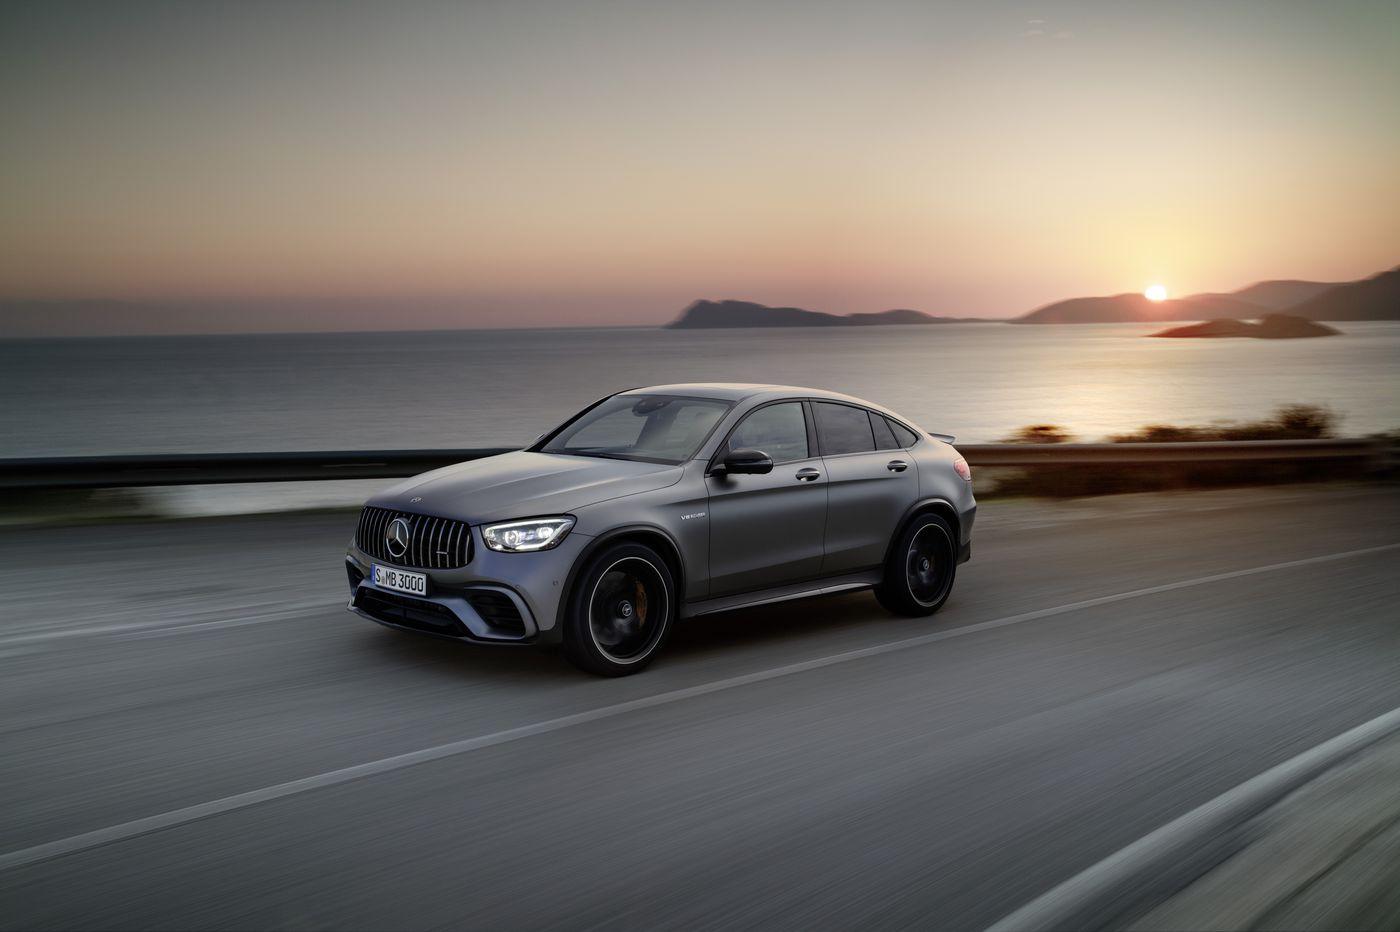 Sporty Mercedes crosses over many boundaries